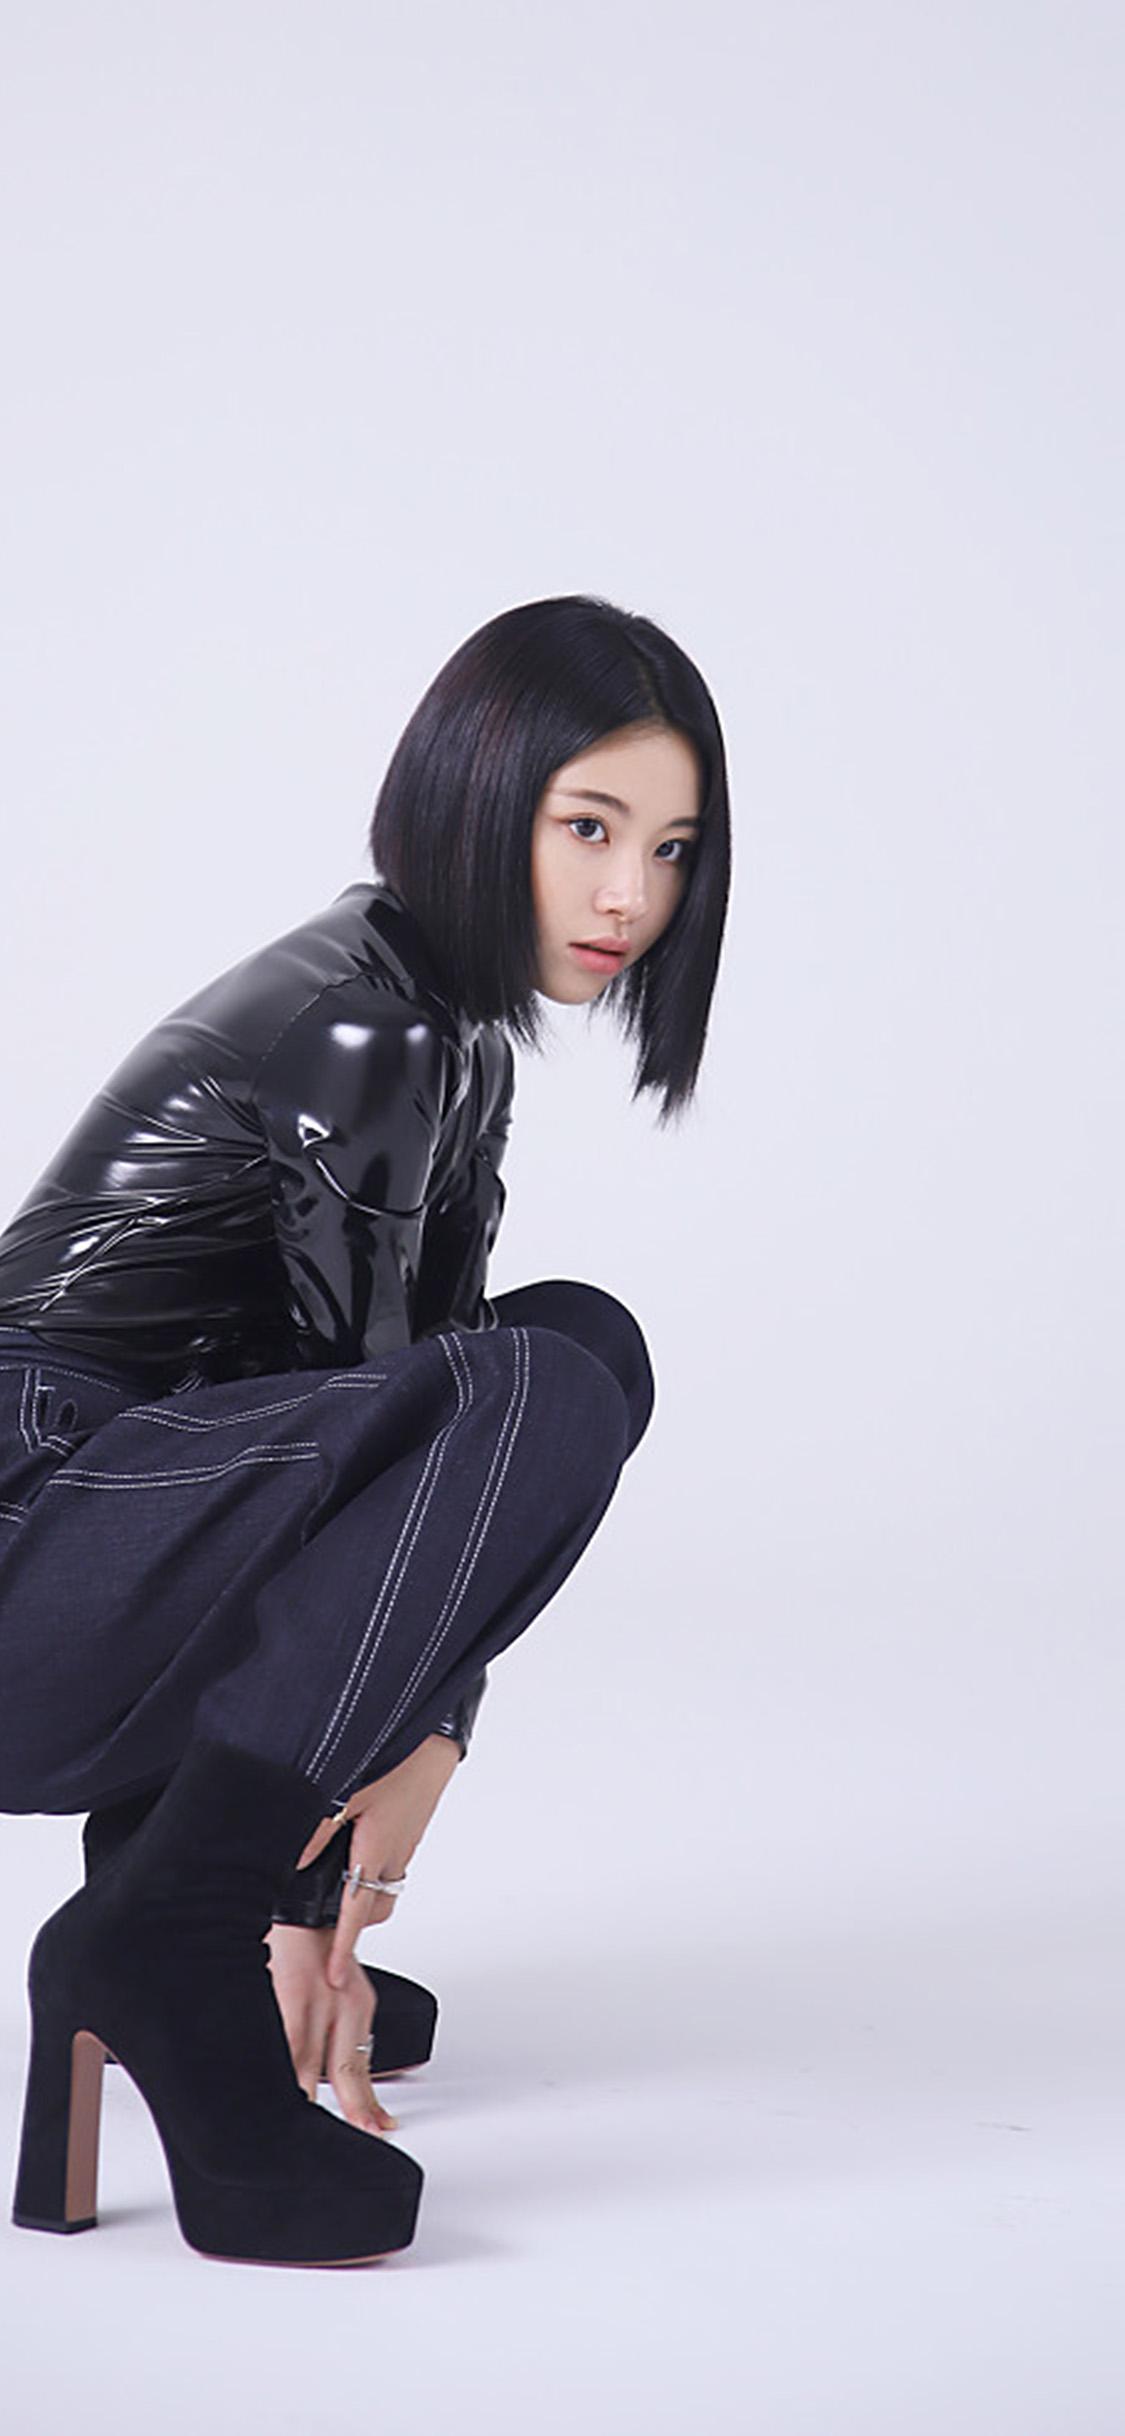 iPhonexpapers.com-Apple-iPhone-wallpaper-ht19-kpop-girl-korean-music